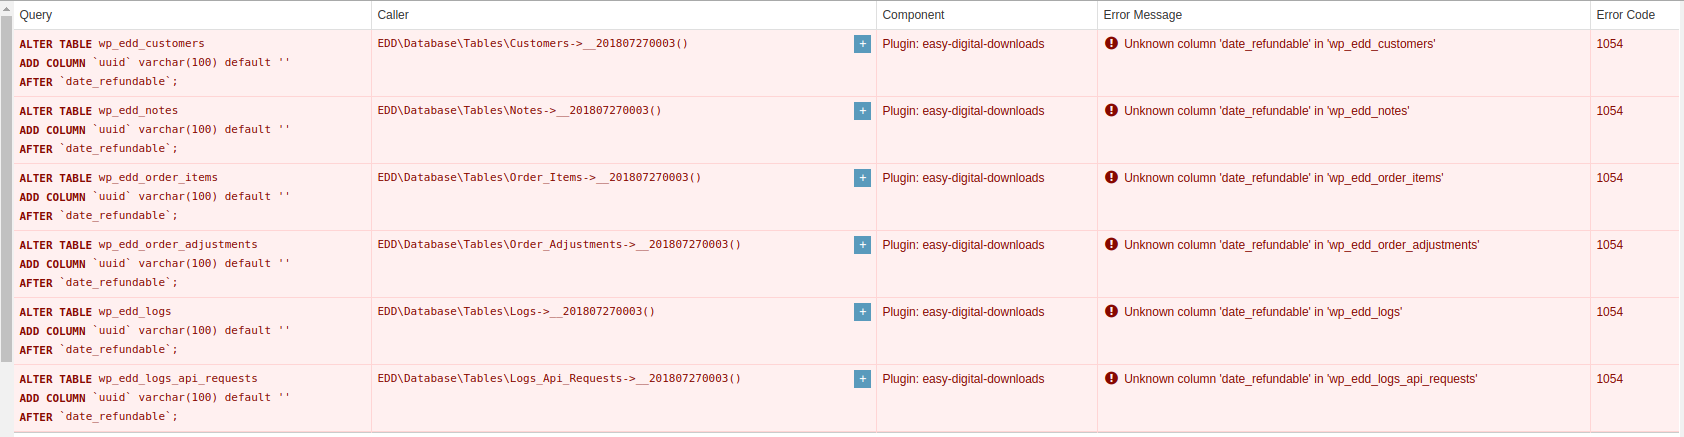 3 0 Wordpress Database Error Unknown Column Date Refundable On